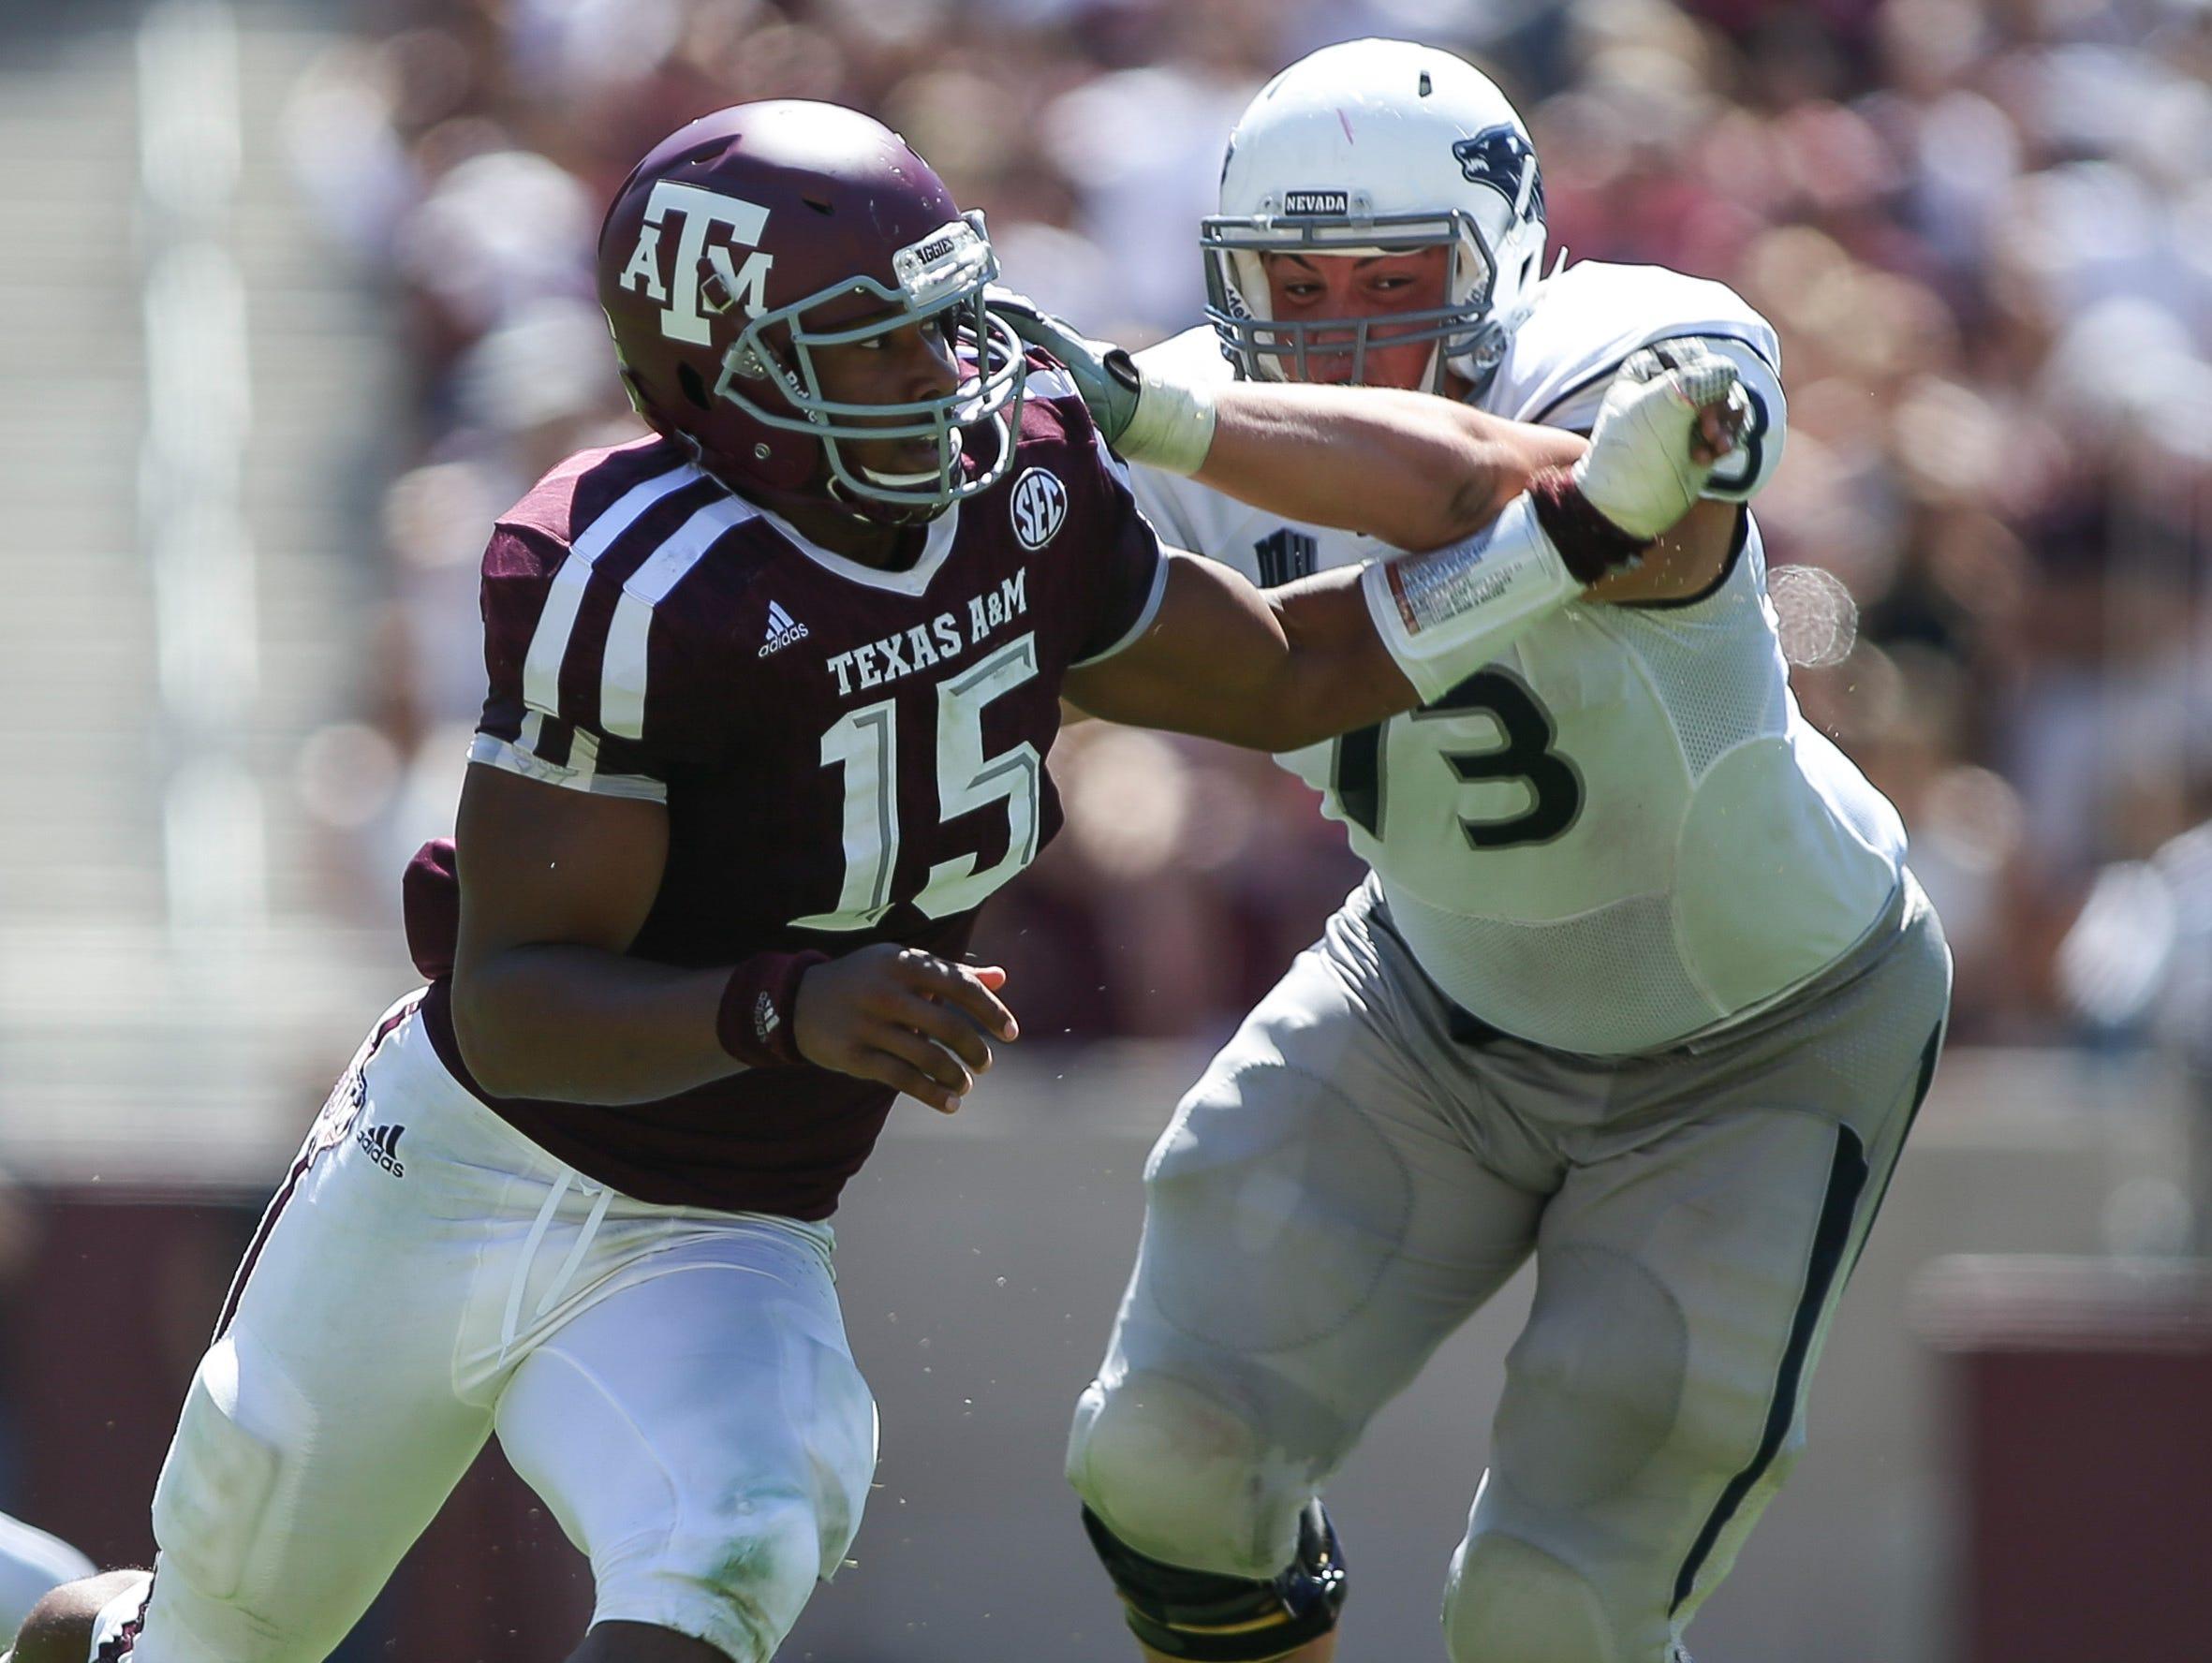 Texas A&M's Myles Garrett (15) leads the SEC in sacks.